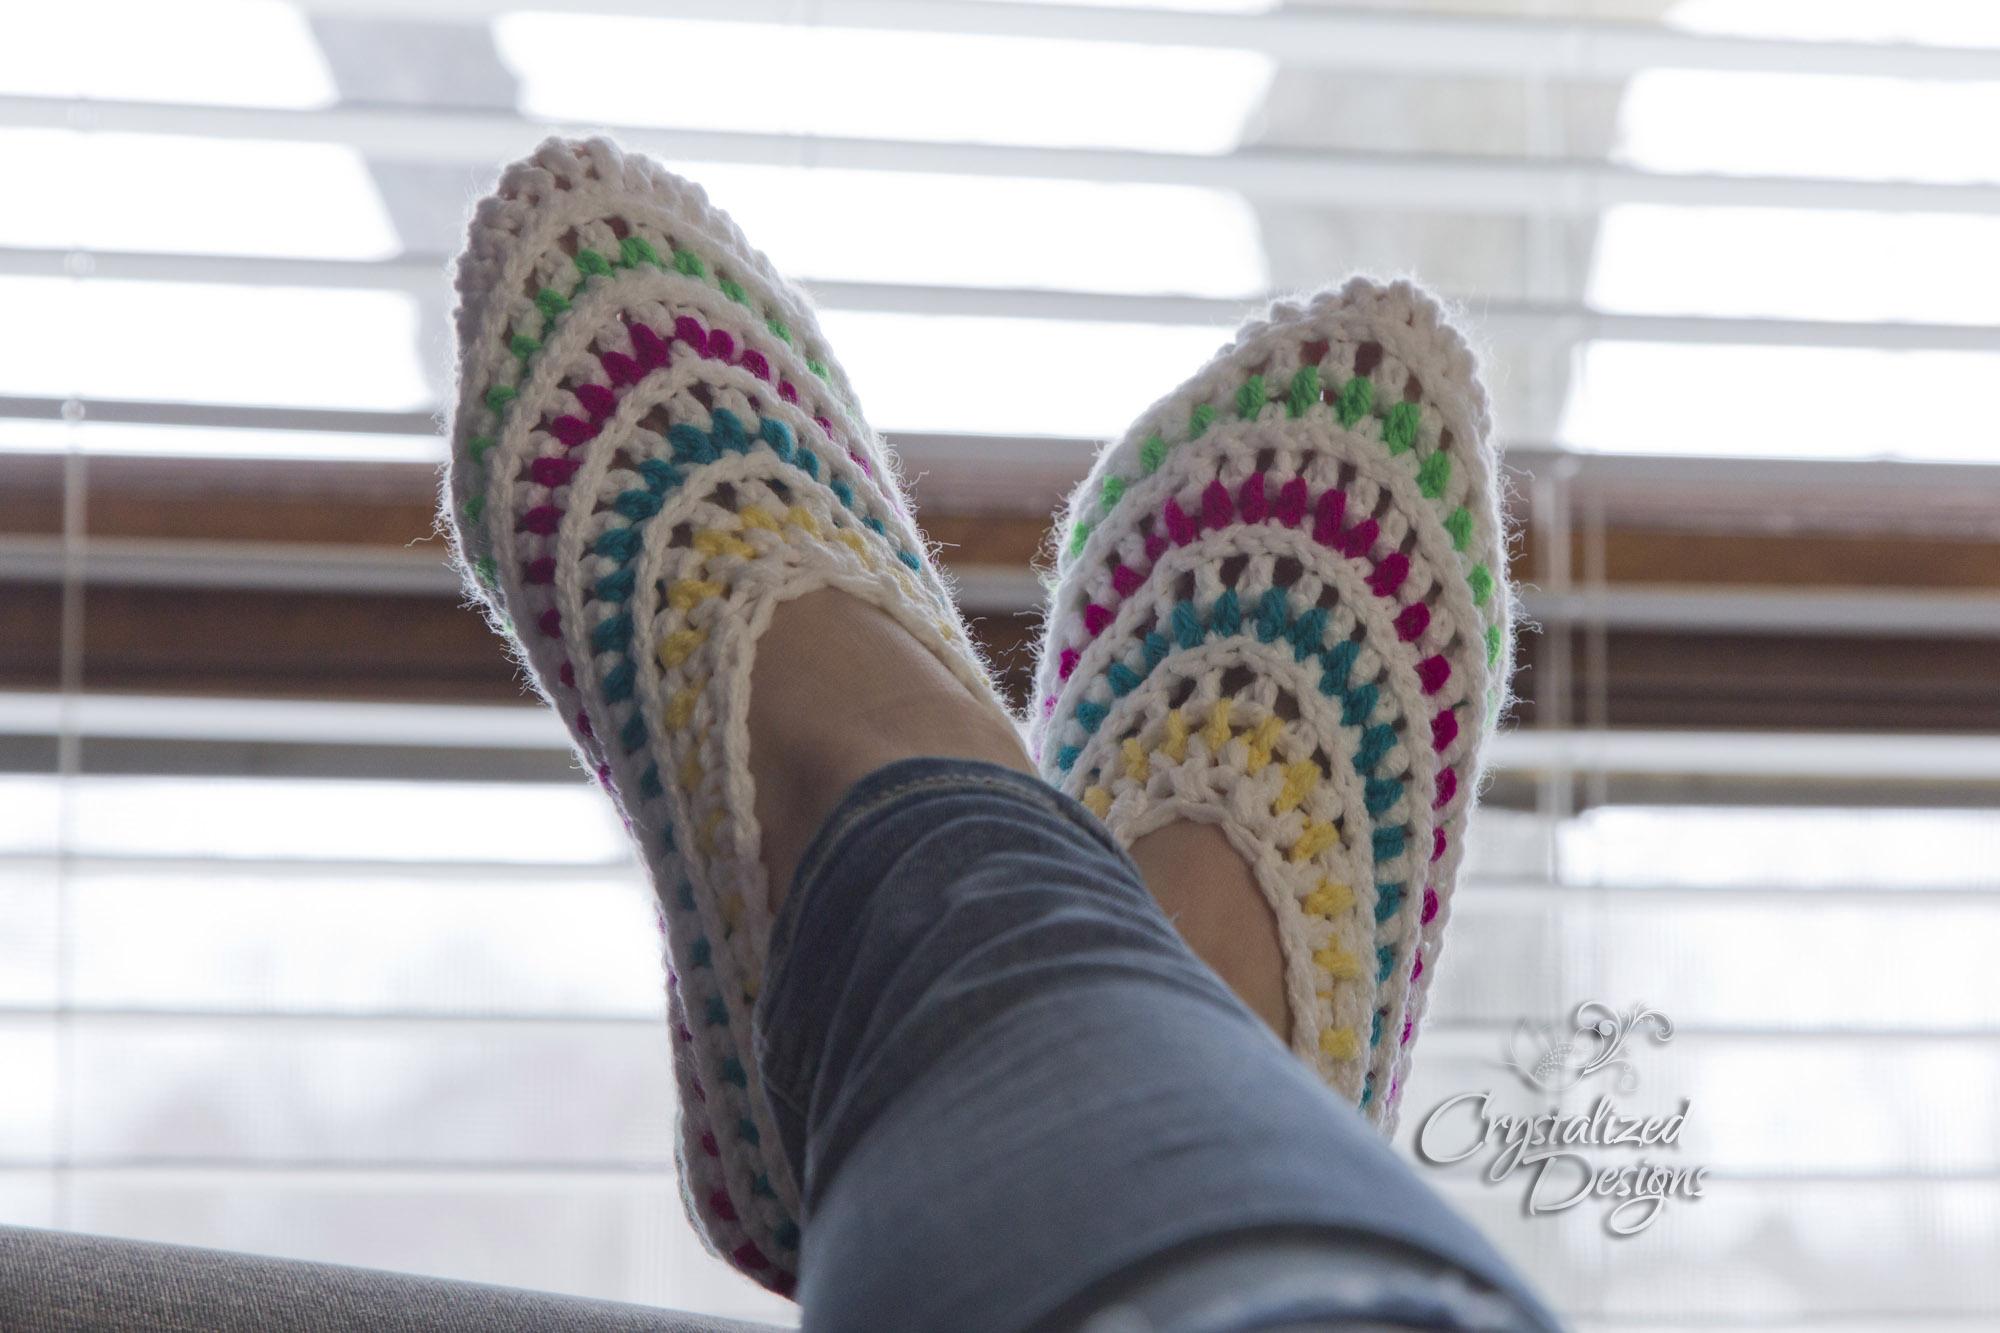 Kaleidoscope Slippers Free Crochet Pattern by Crystalized Designs